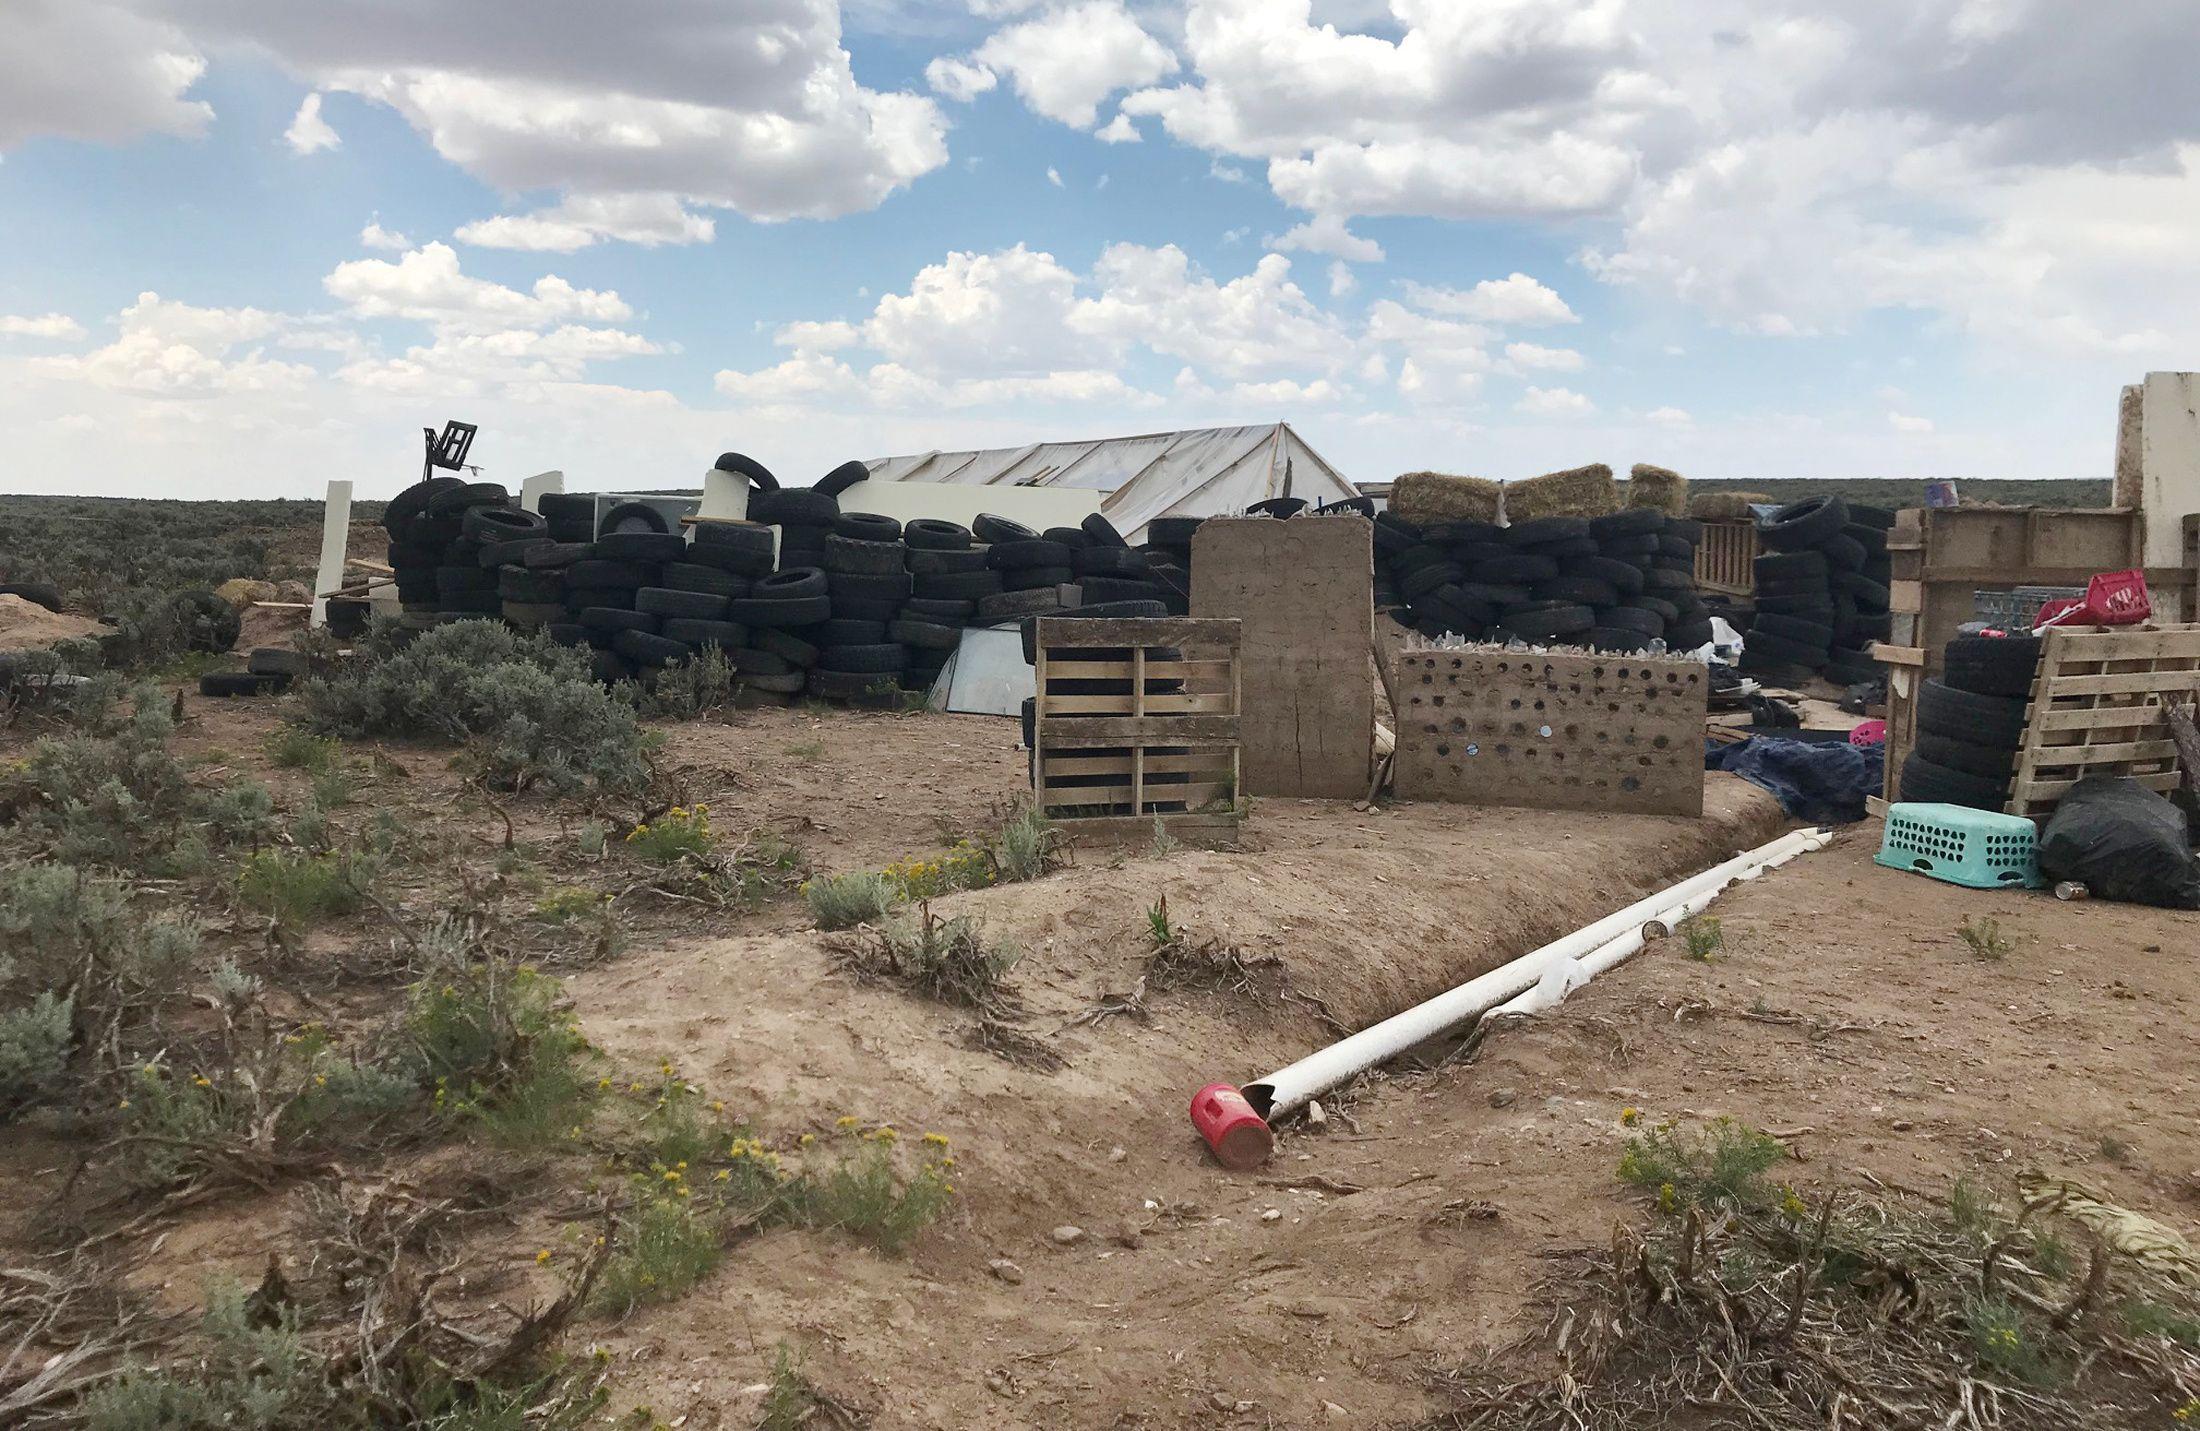 New Mexico Compound